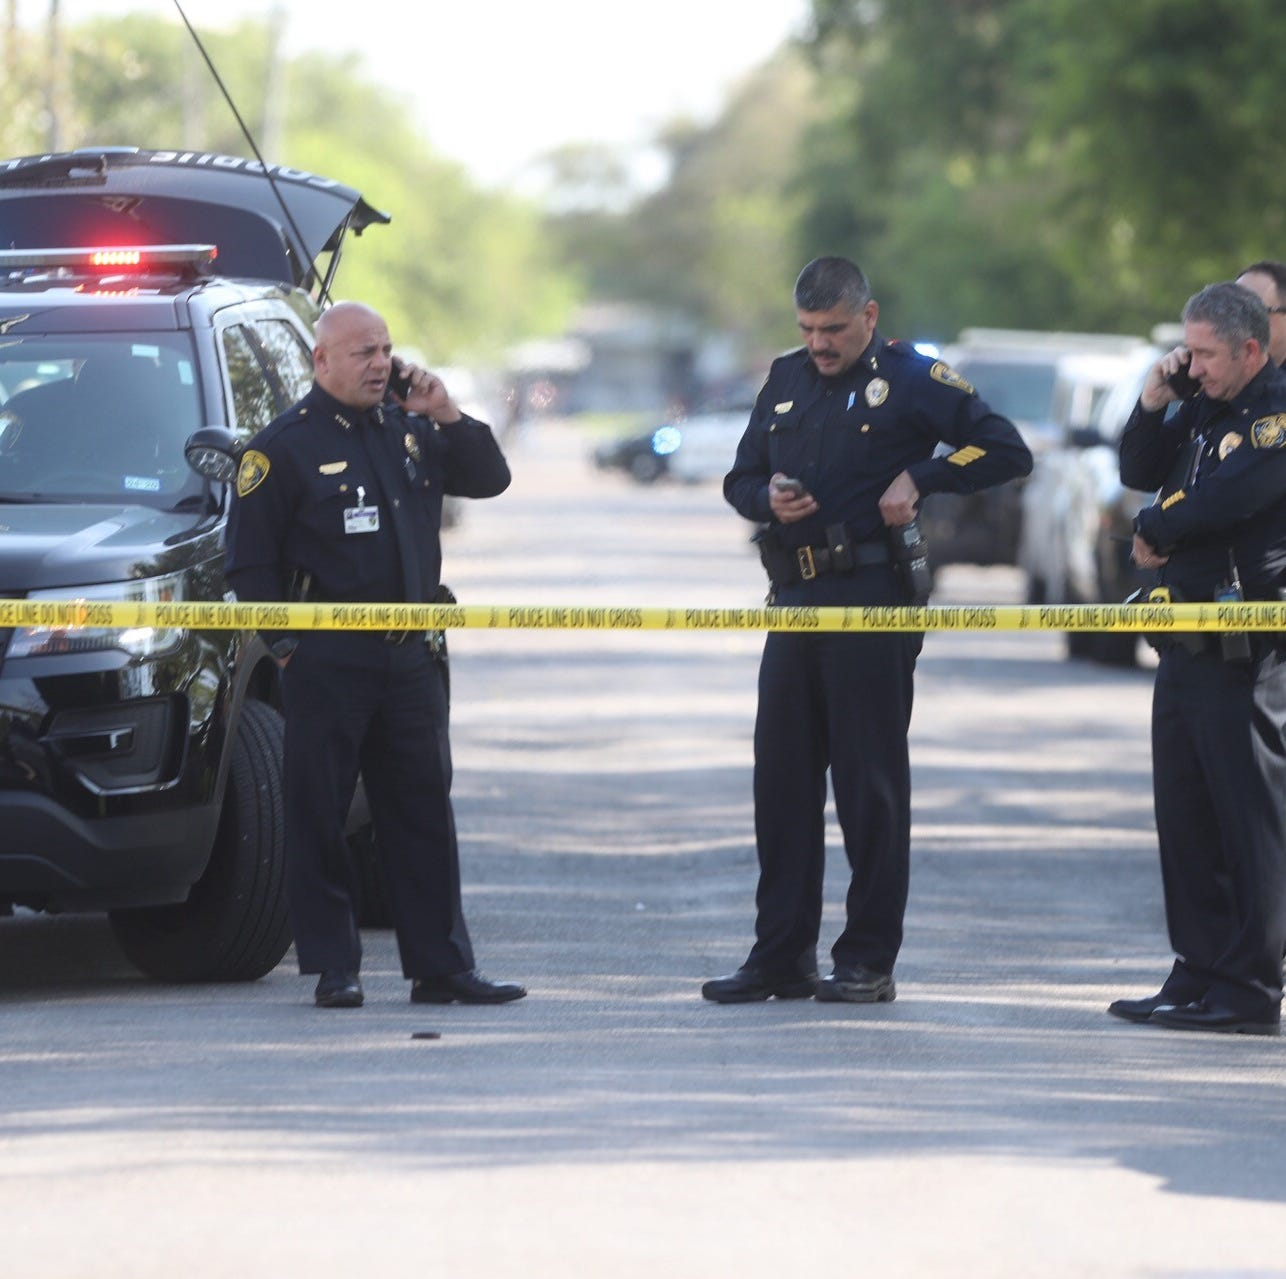 Man shot in officer-involved shooting in Northside Corpus Christi